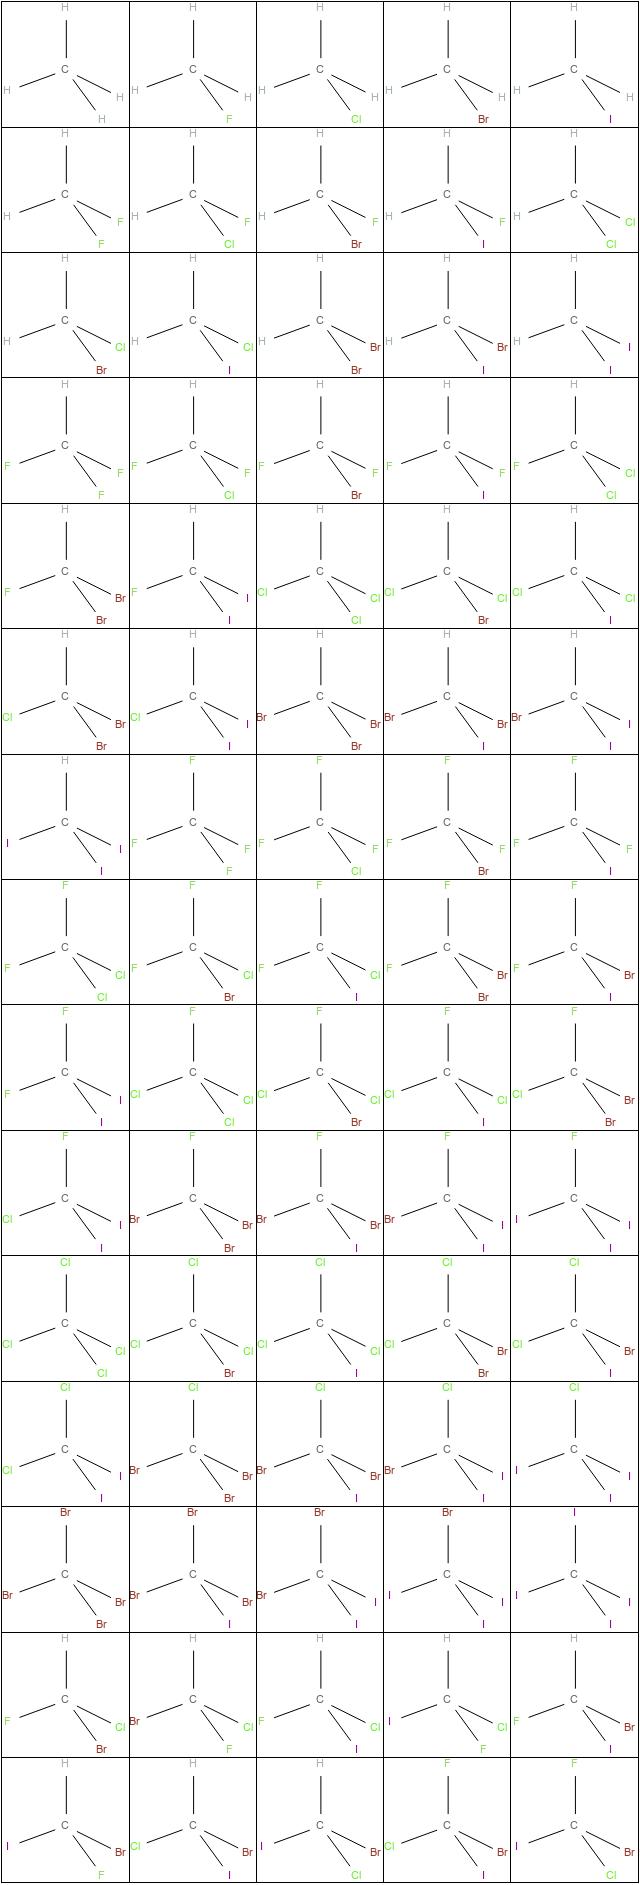 halomethanes